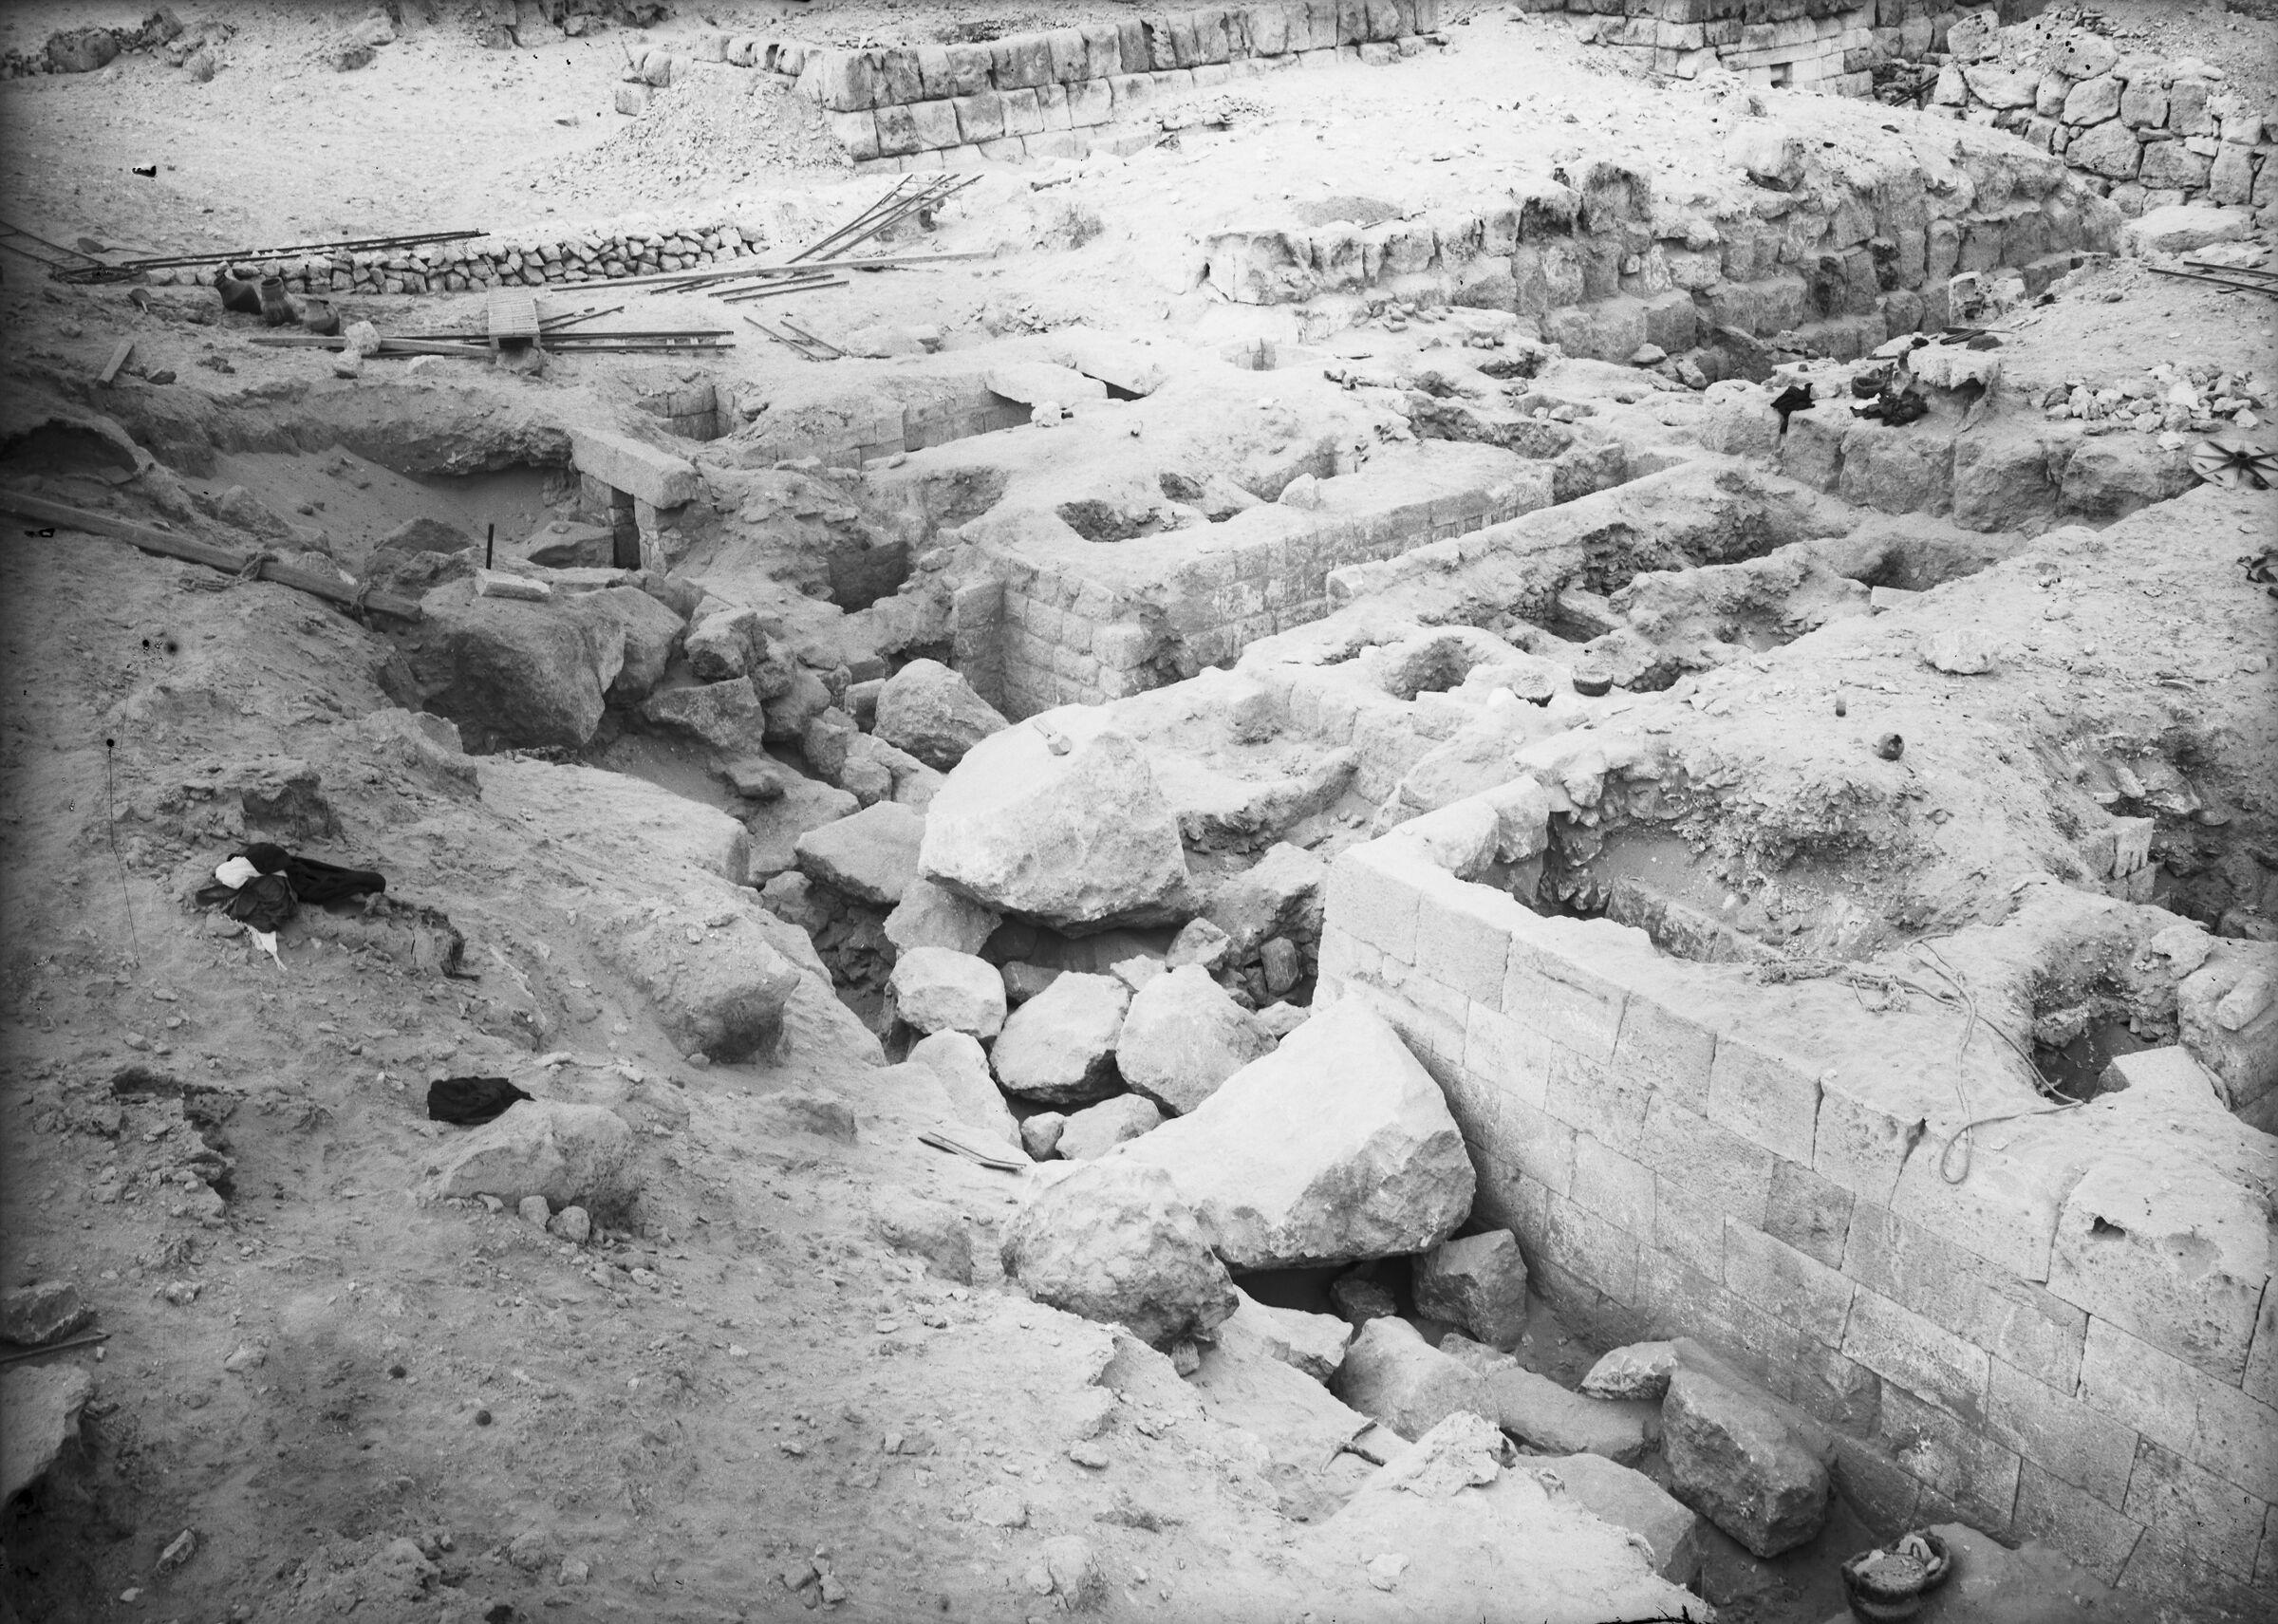 Western Cemetery: Site: Giza; View: G 4510, G 4610, G 4513, G 4512, G 4517, G 4516, G 4614, G 4615